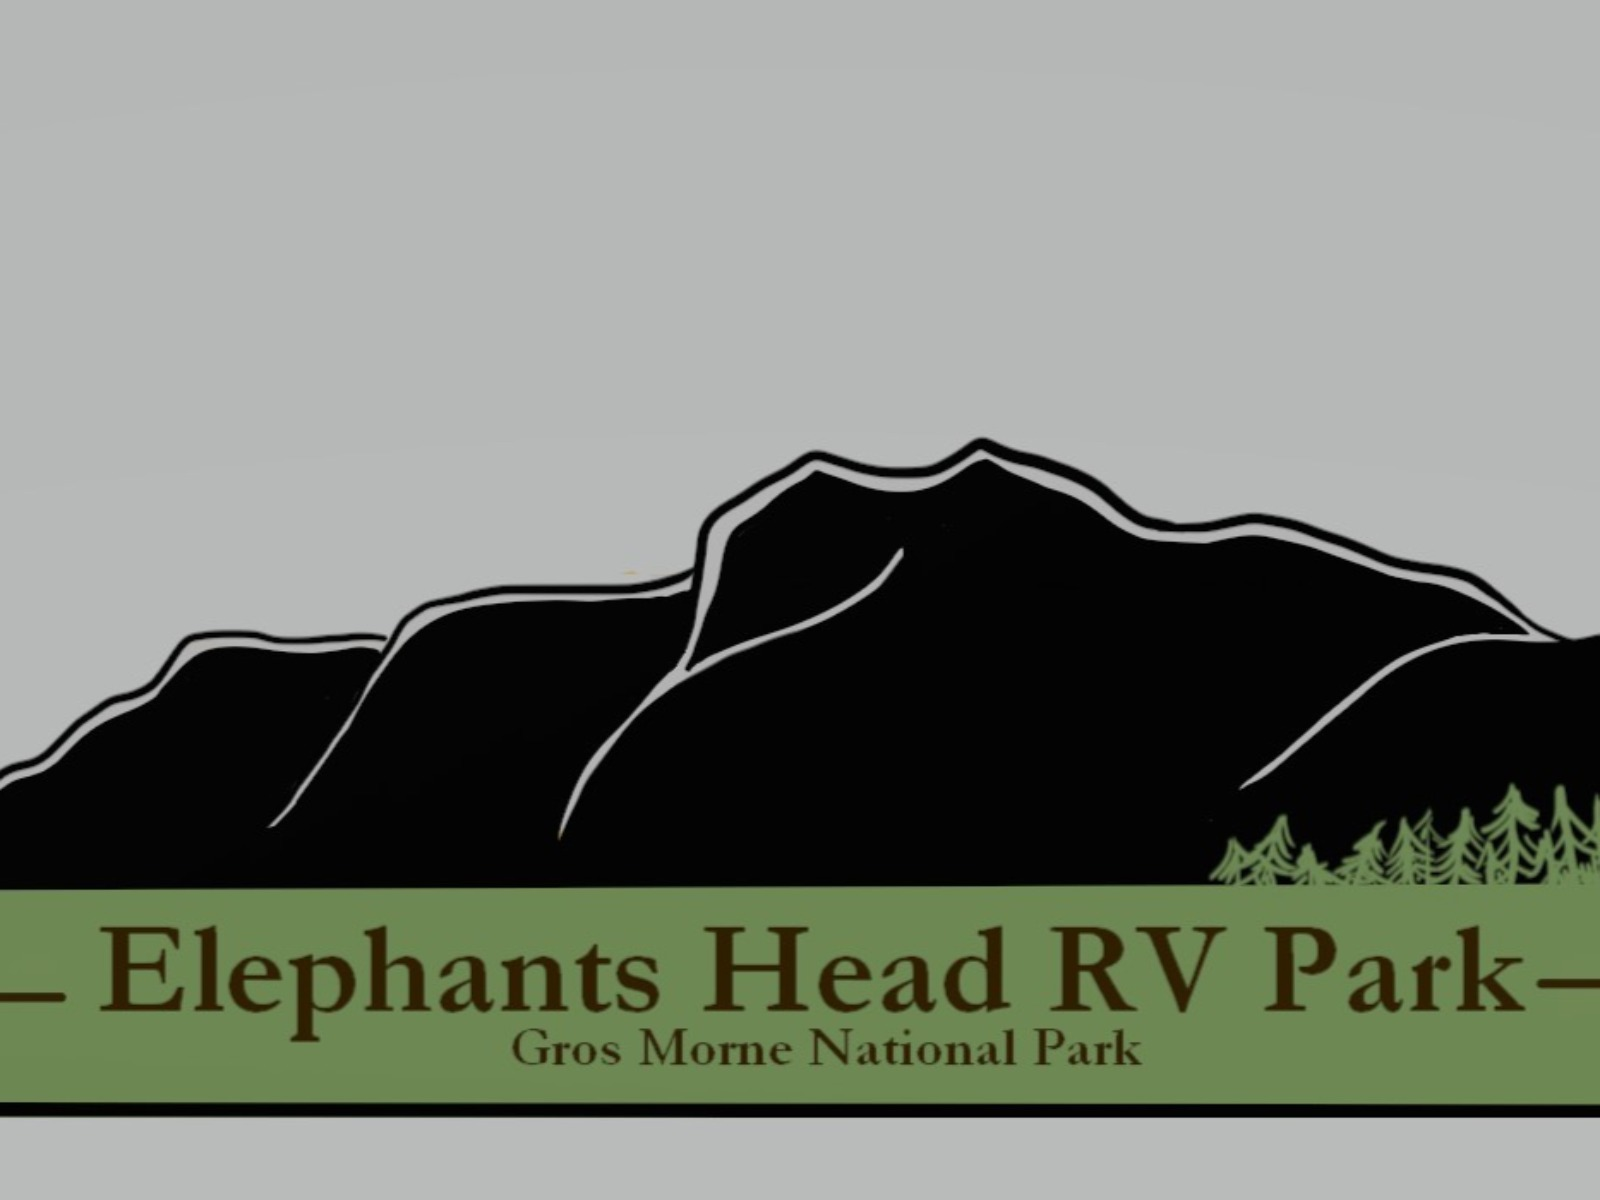 Elephants Head RV Park